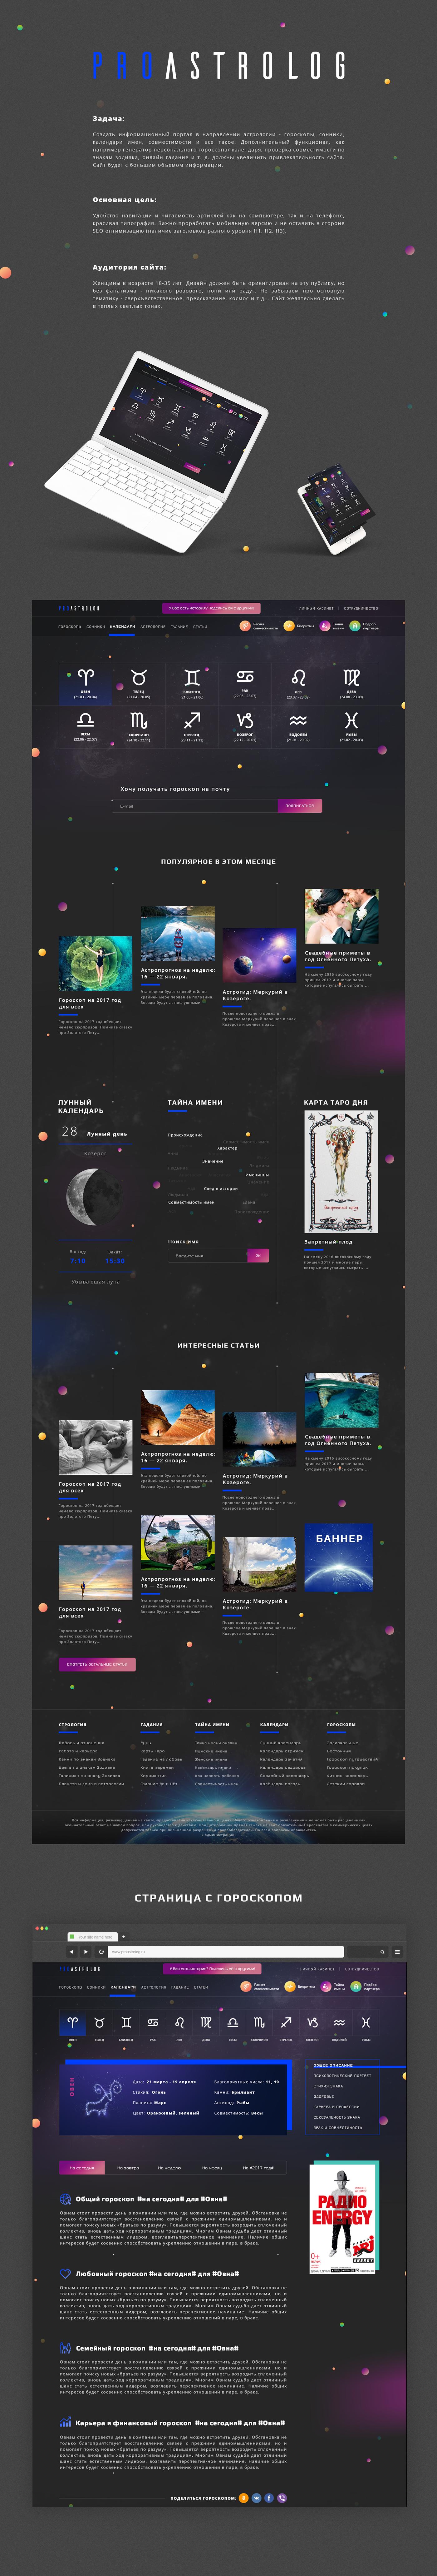 Astrological portal on Behance